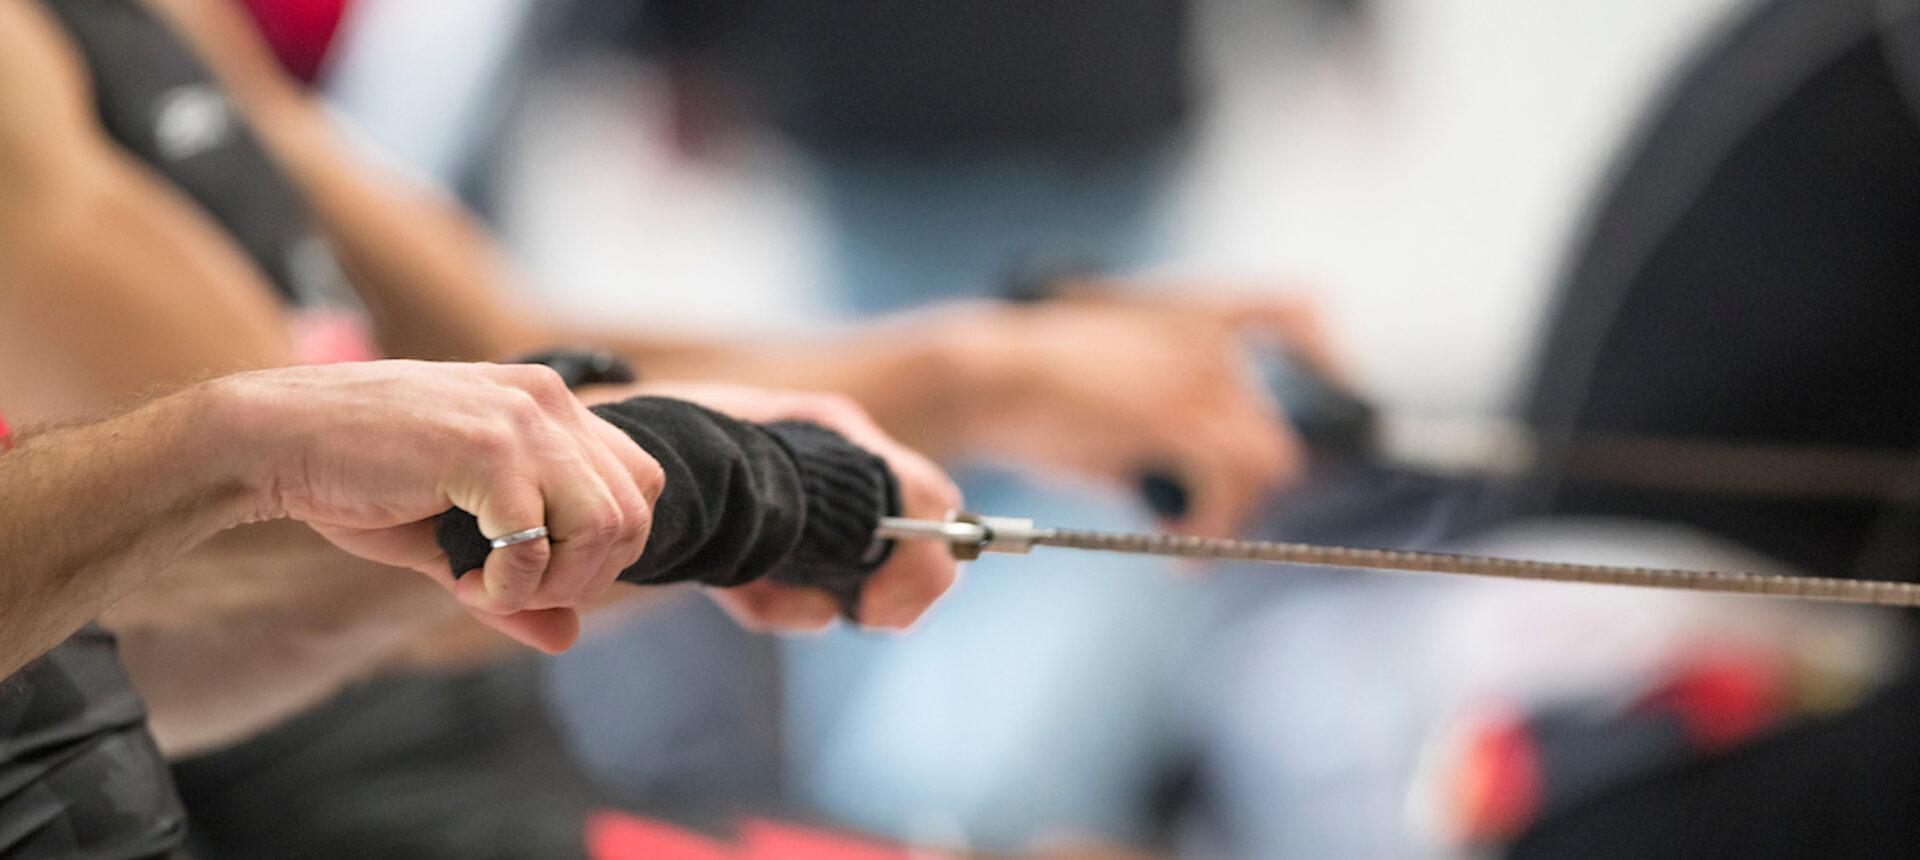 Mississauga accueillera les Championnats du monde d'aviron en salle 2023